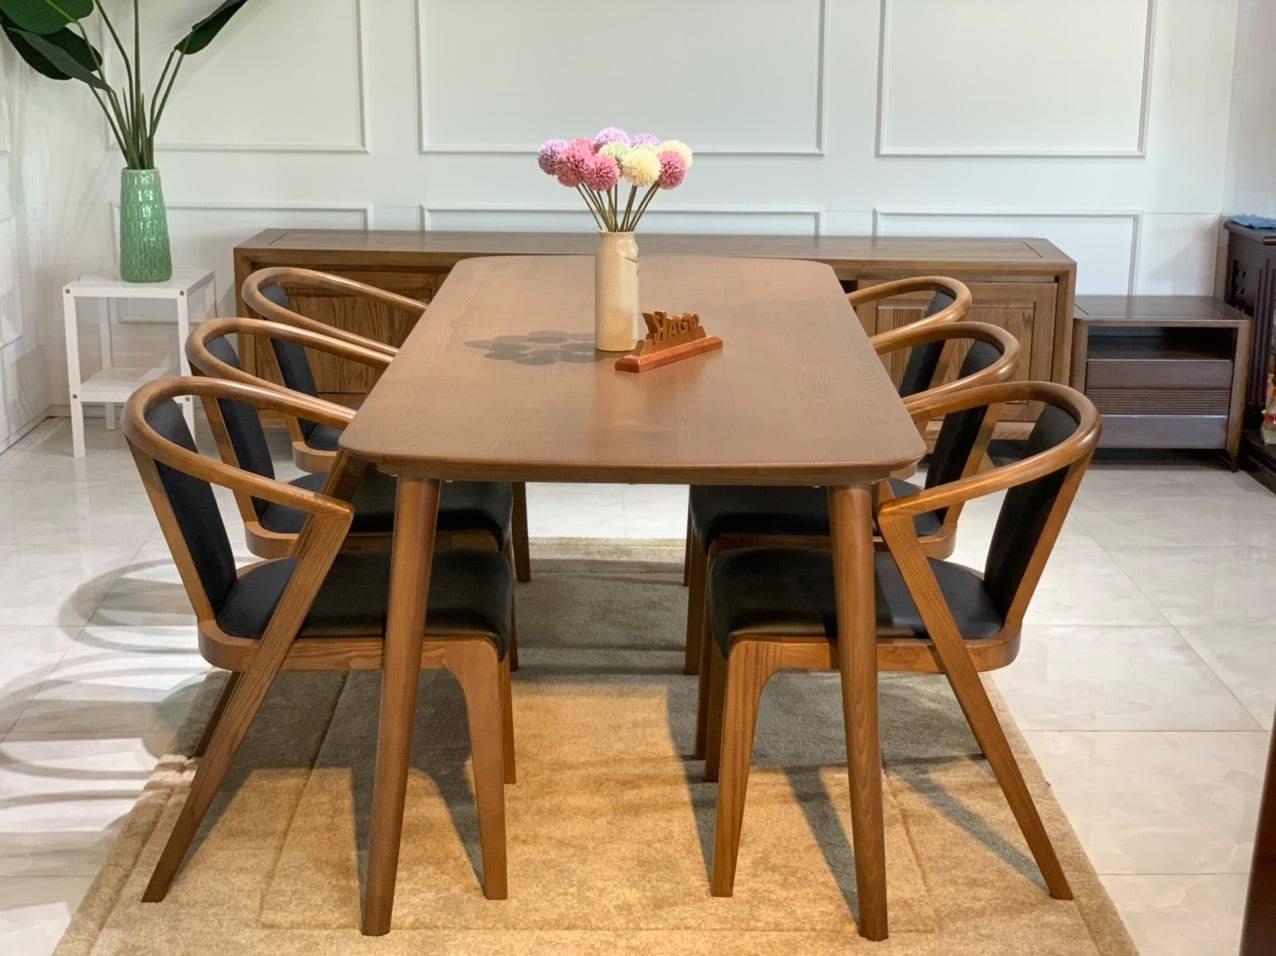 Bàn ghế ăn gỗ HP266